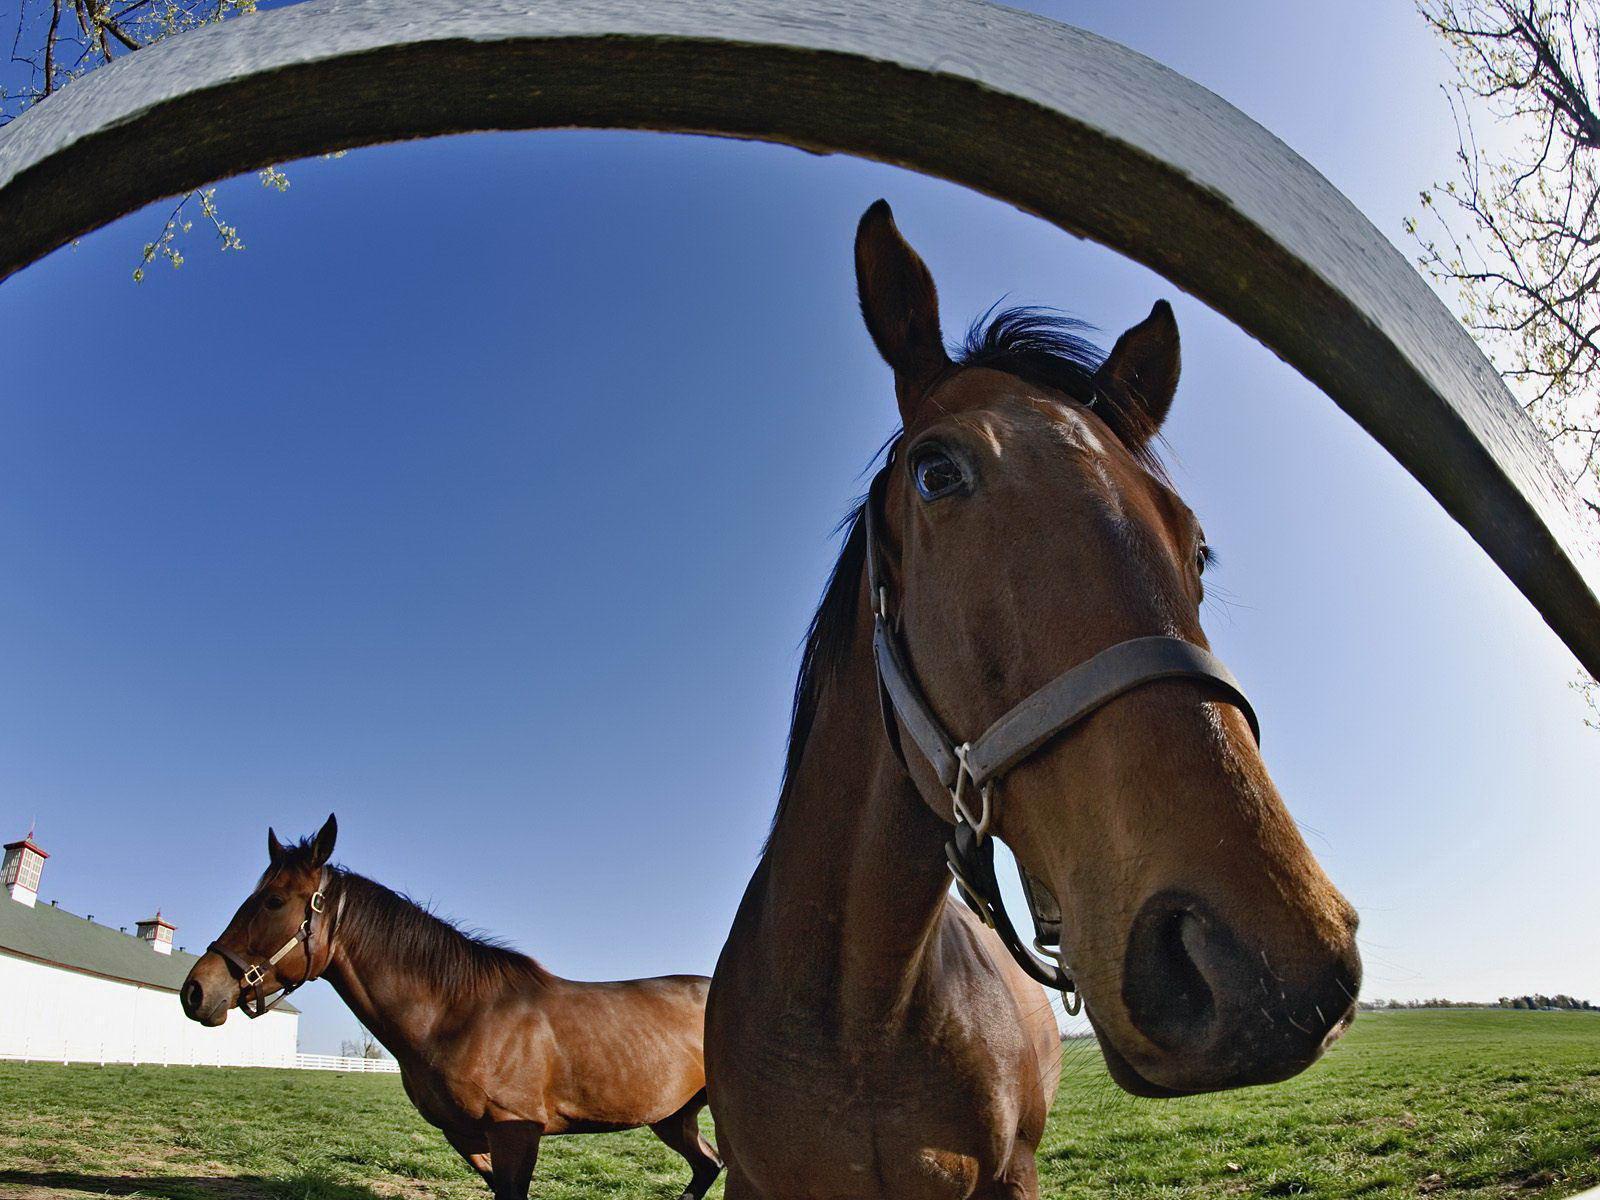 horse backgrounds image